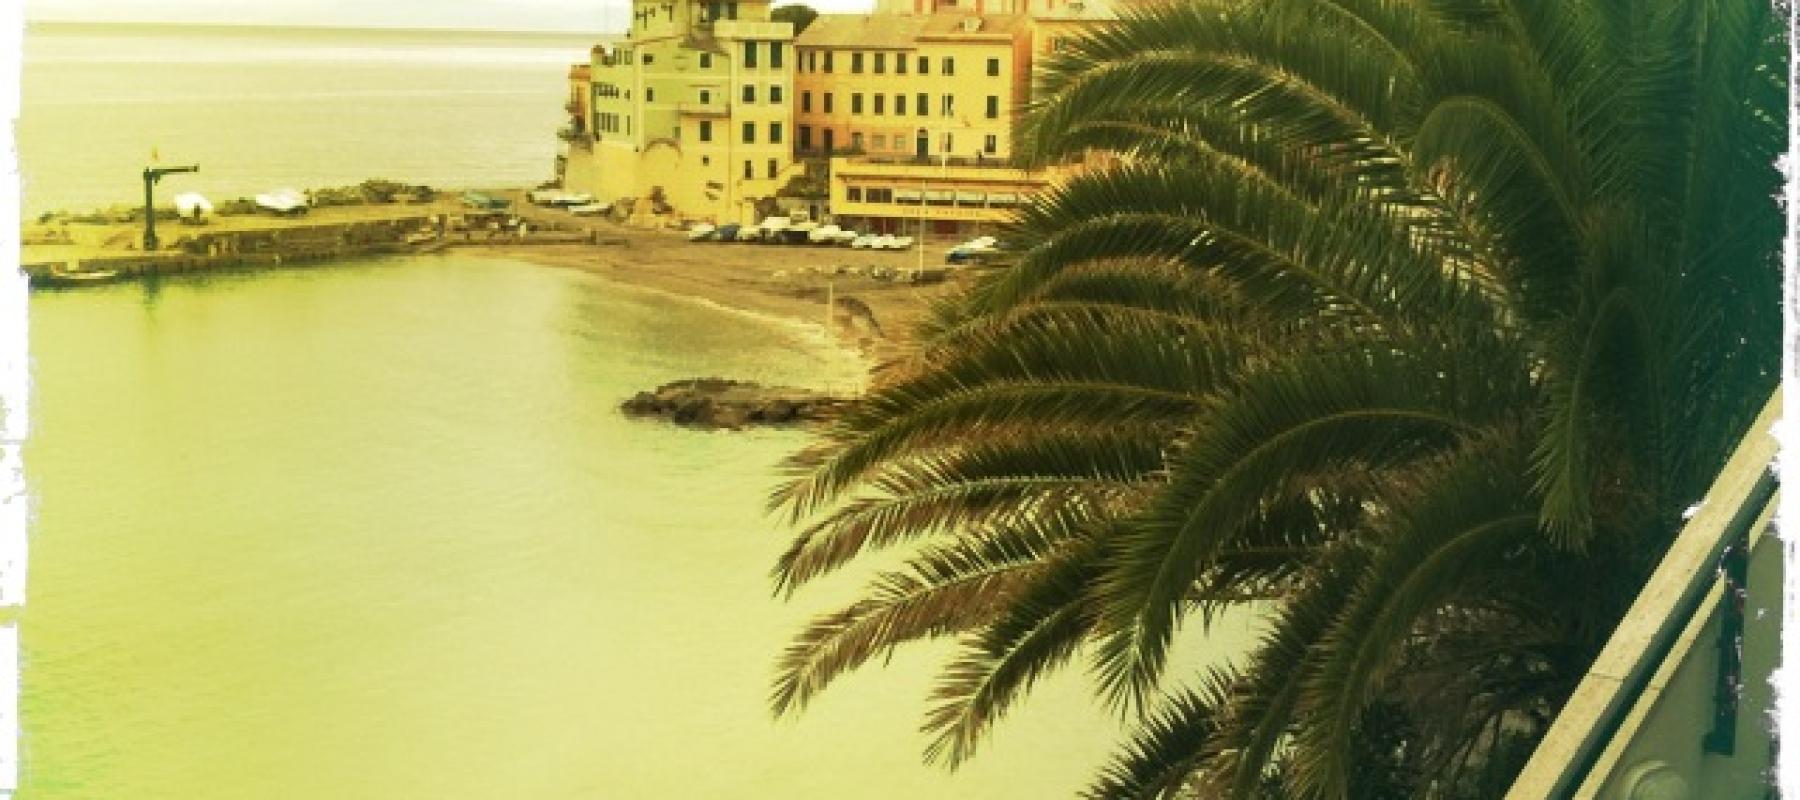 Impressionen aus Genua